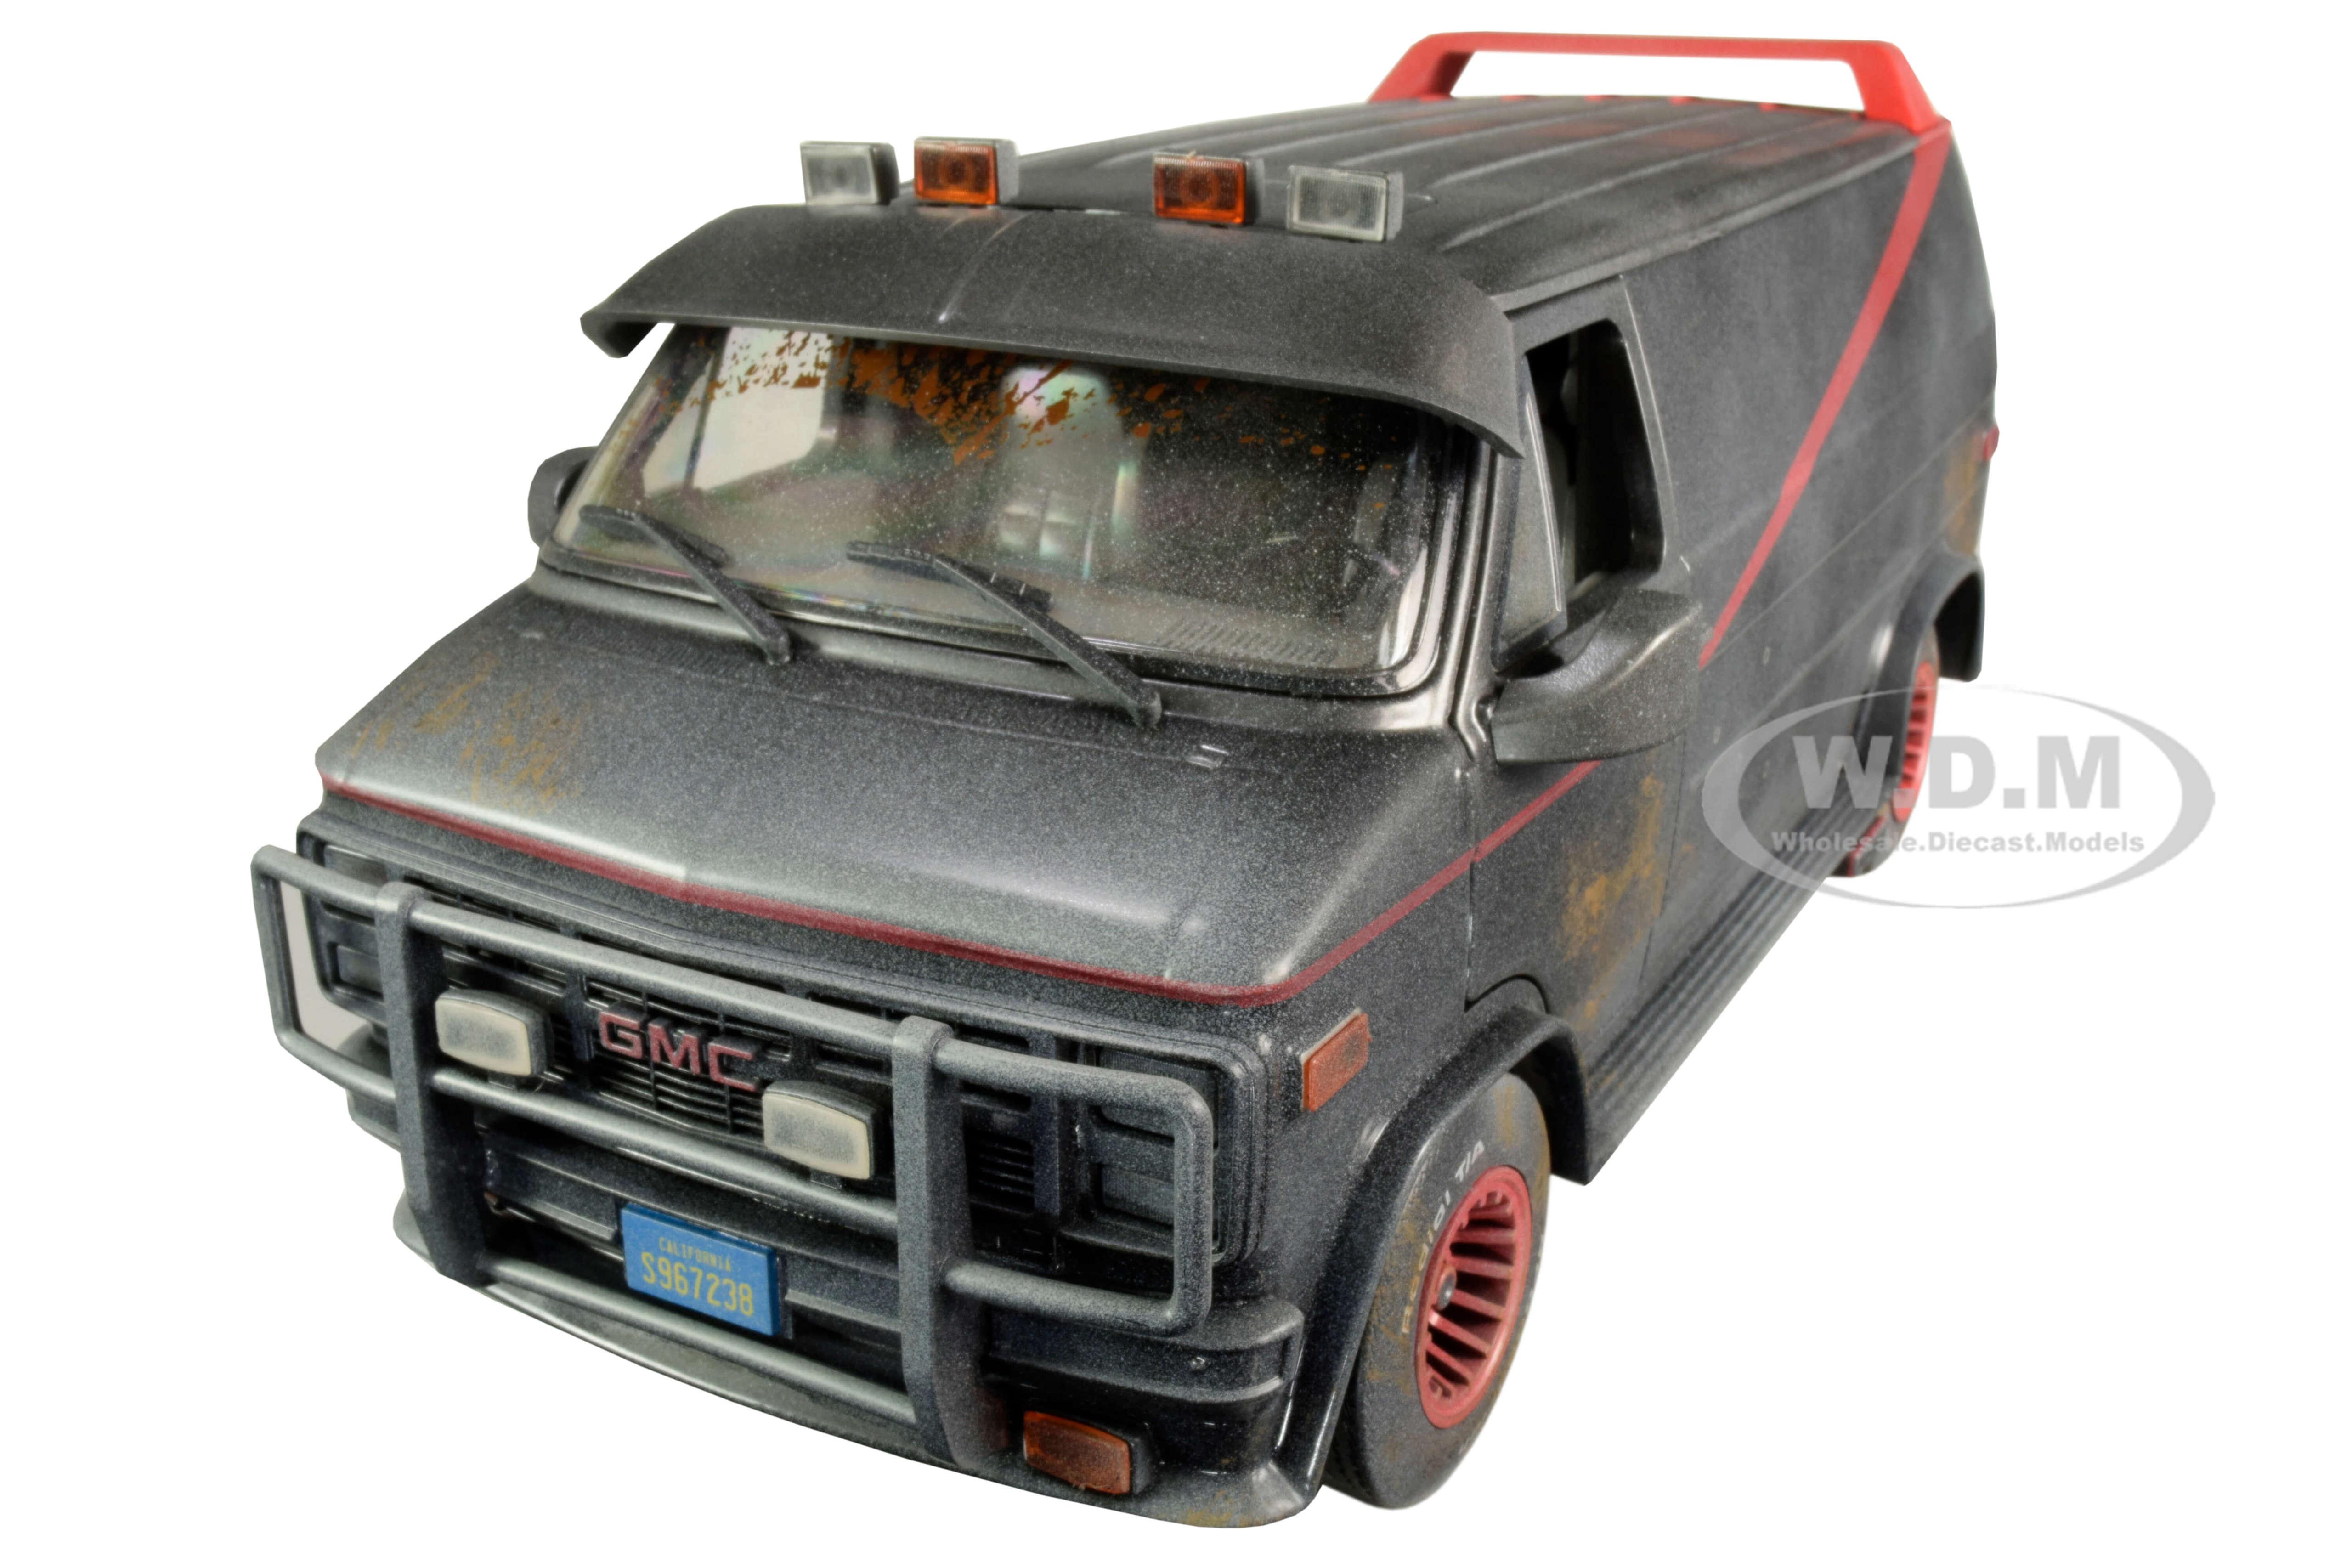 1983 GMC Vandura Black Weathered Version with Bullet Holes